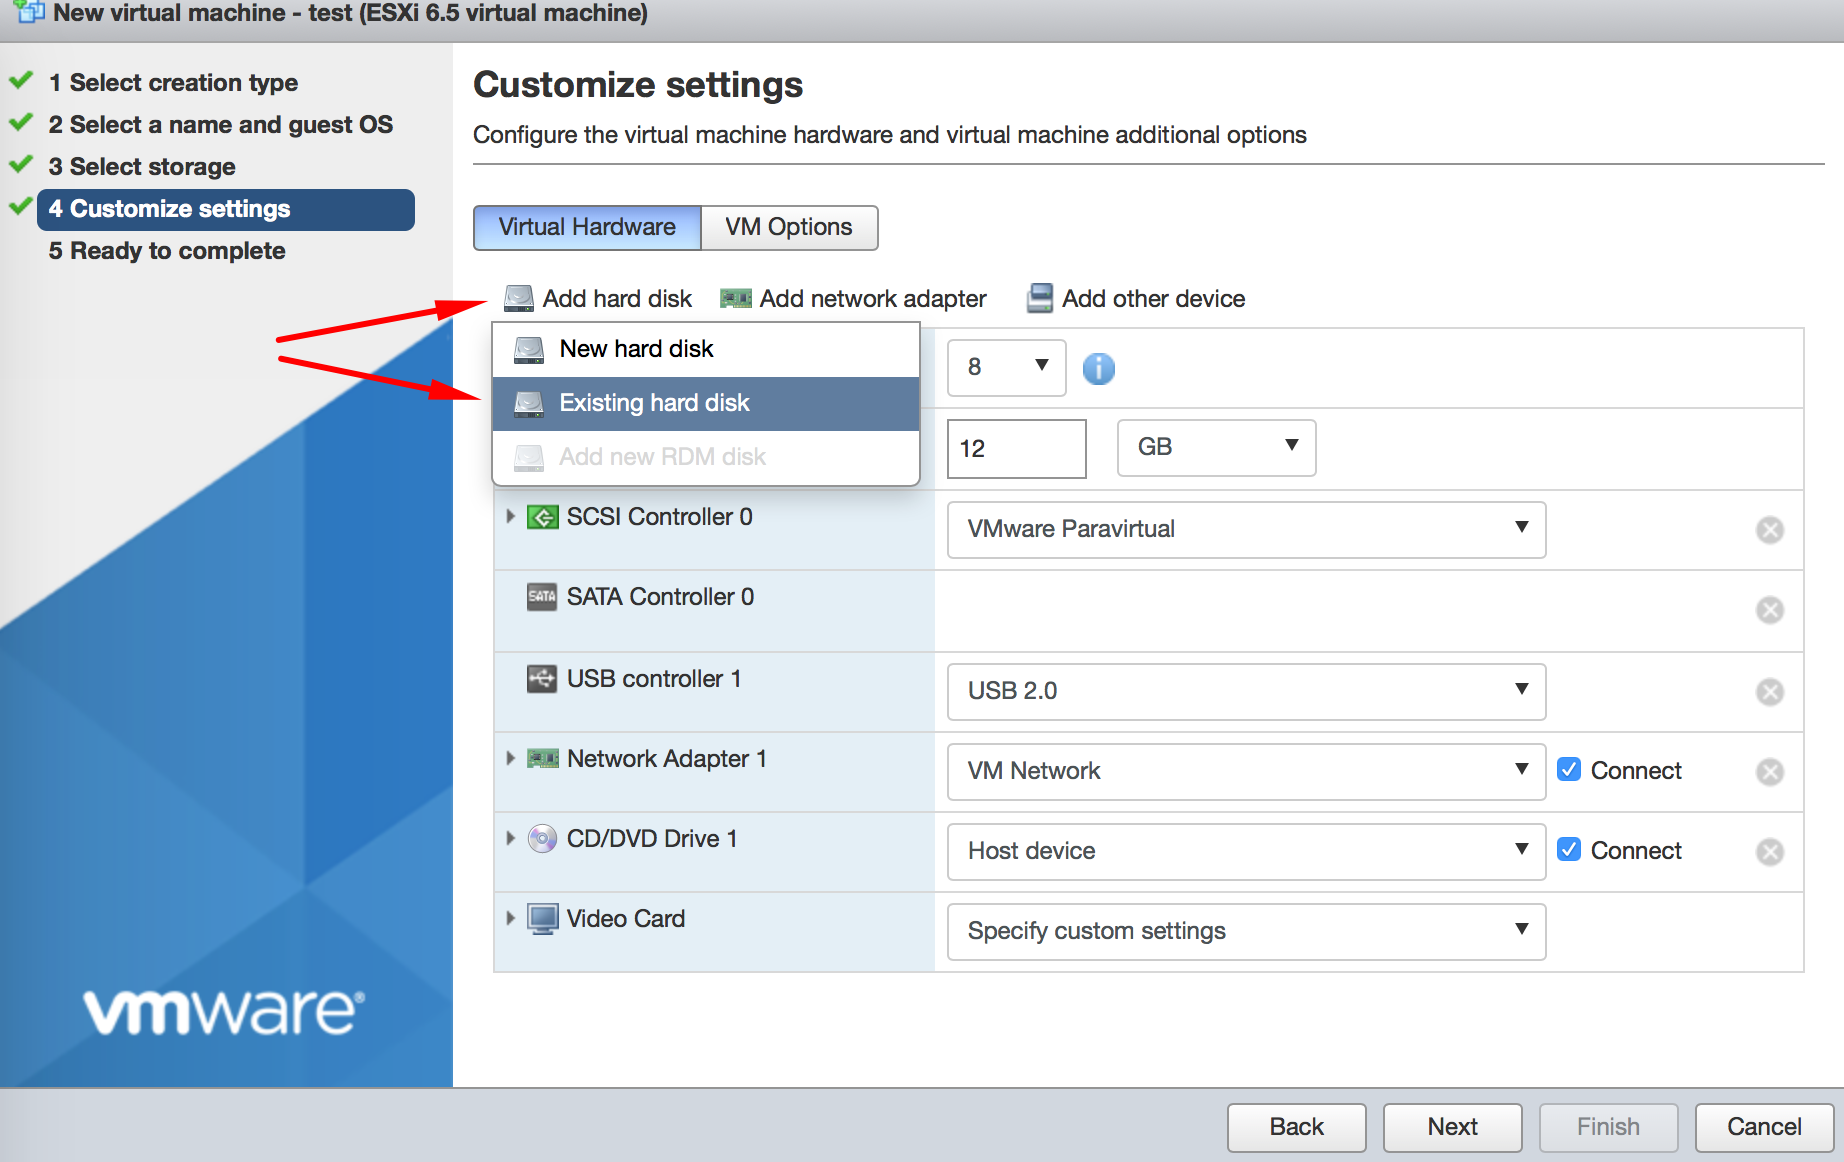 Customize settings 2